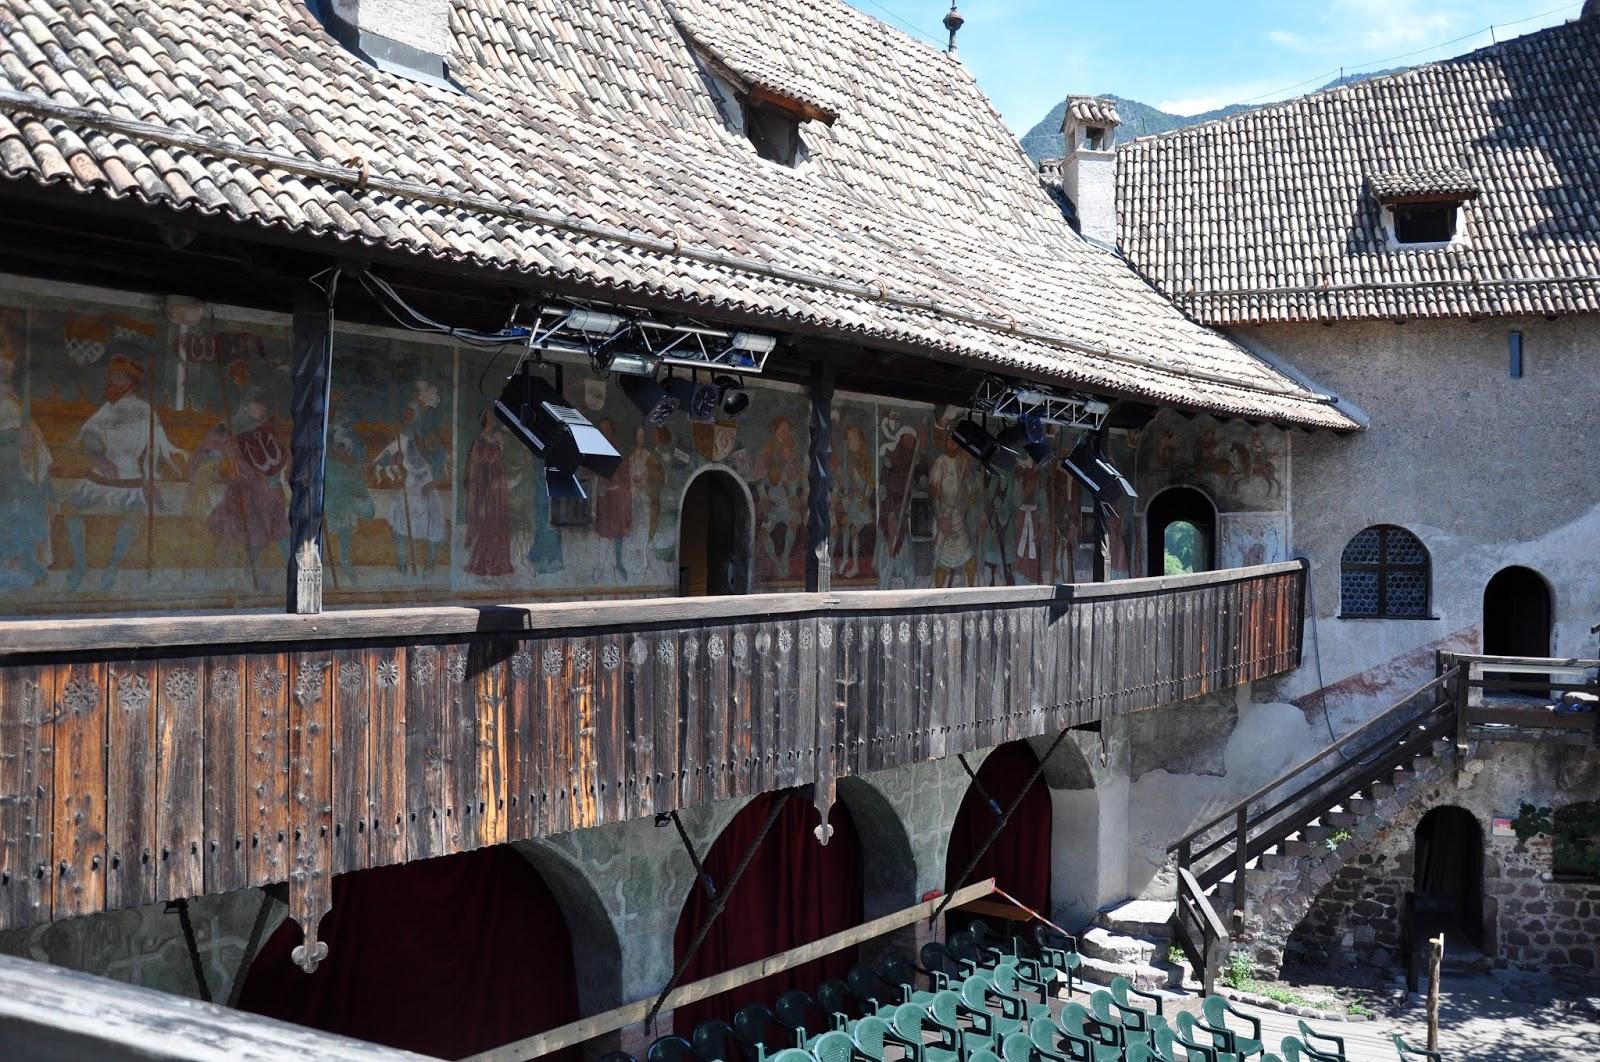 The painted veranda, Runkelstein Castle, Bolzano, South Tyrol, Italy